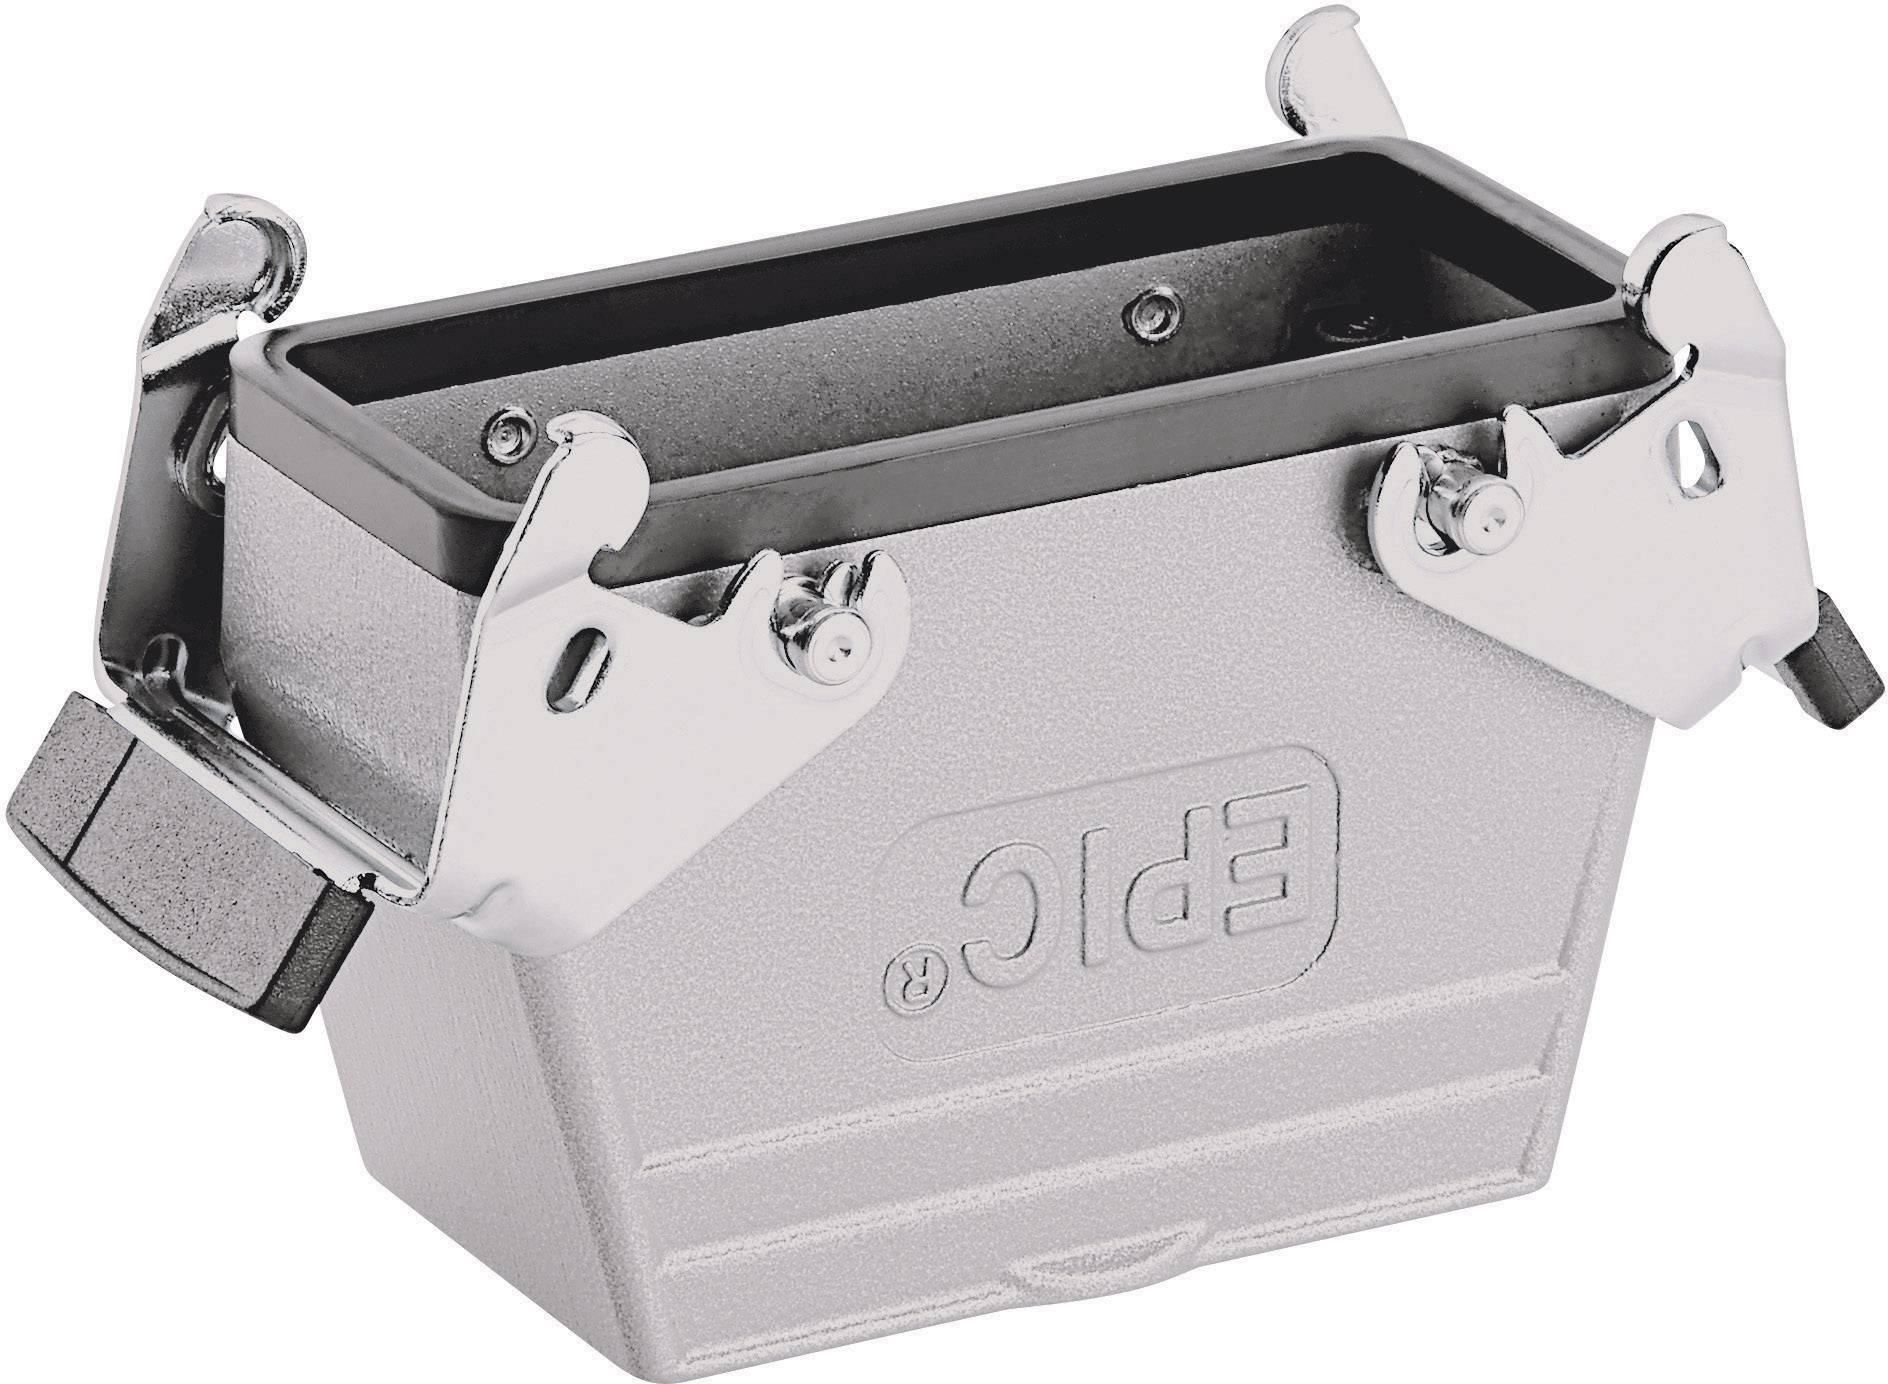 LappKabel EPIC® H-B 16 TBF M25 (19086000), M 25, IP65, šedá